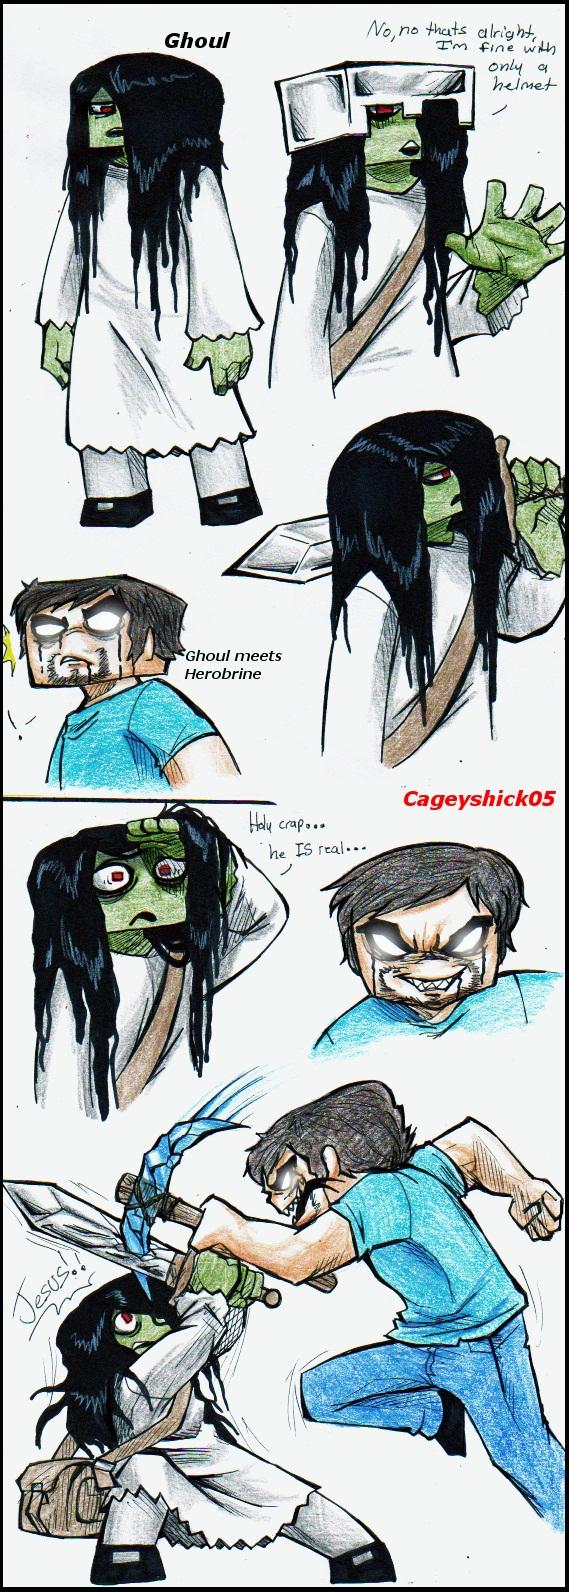 http://img.niceminecraft.net/Funny/Minecraft-comic-18.jpg